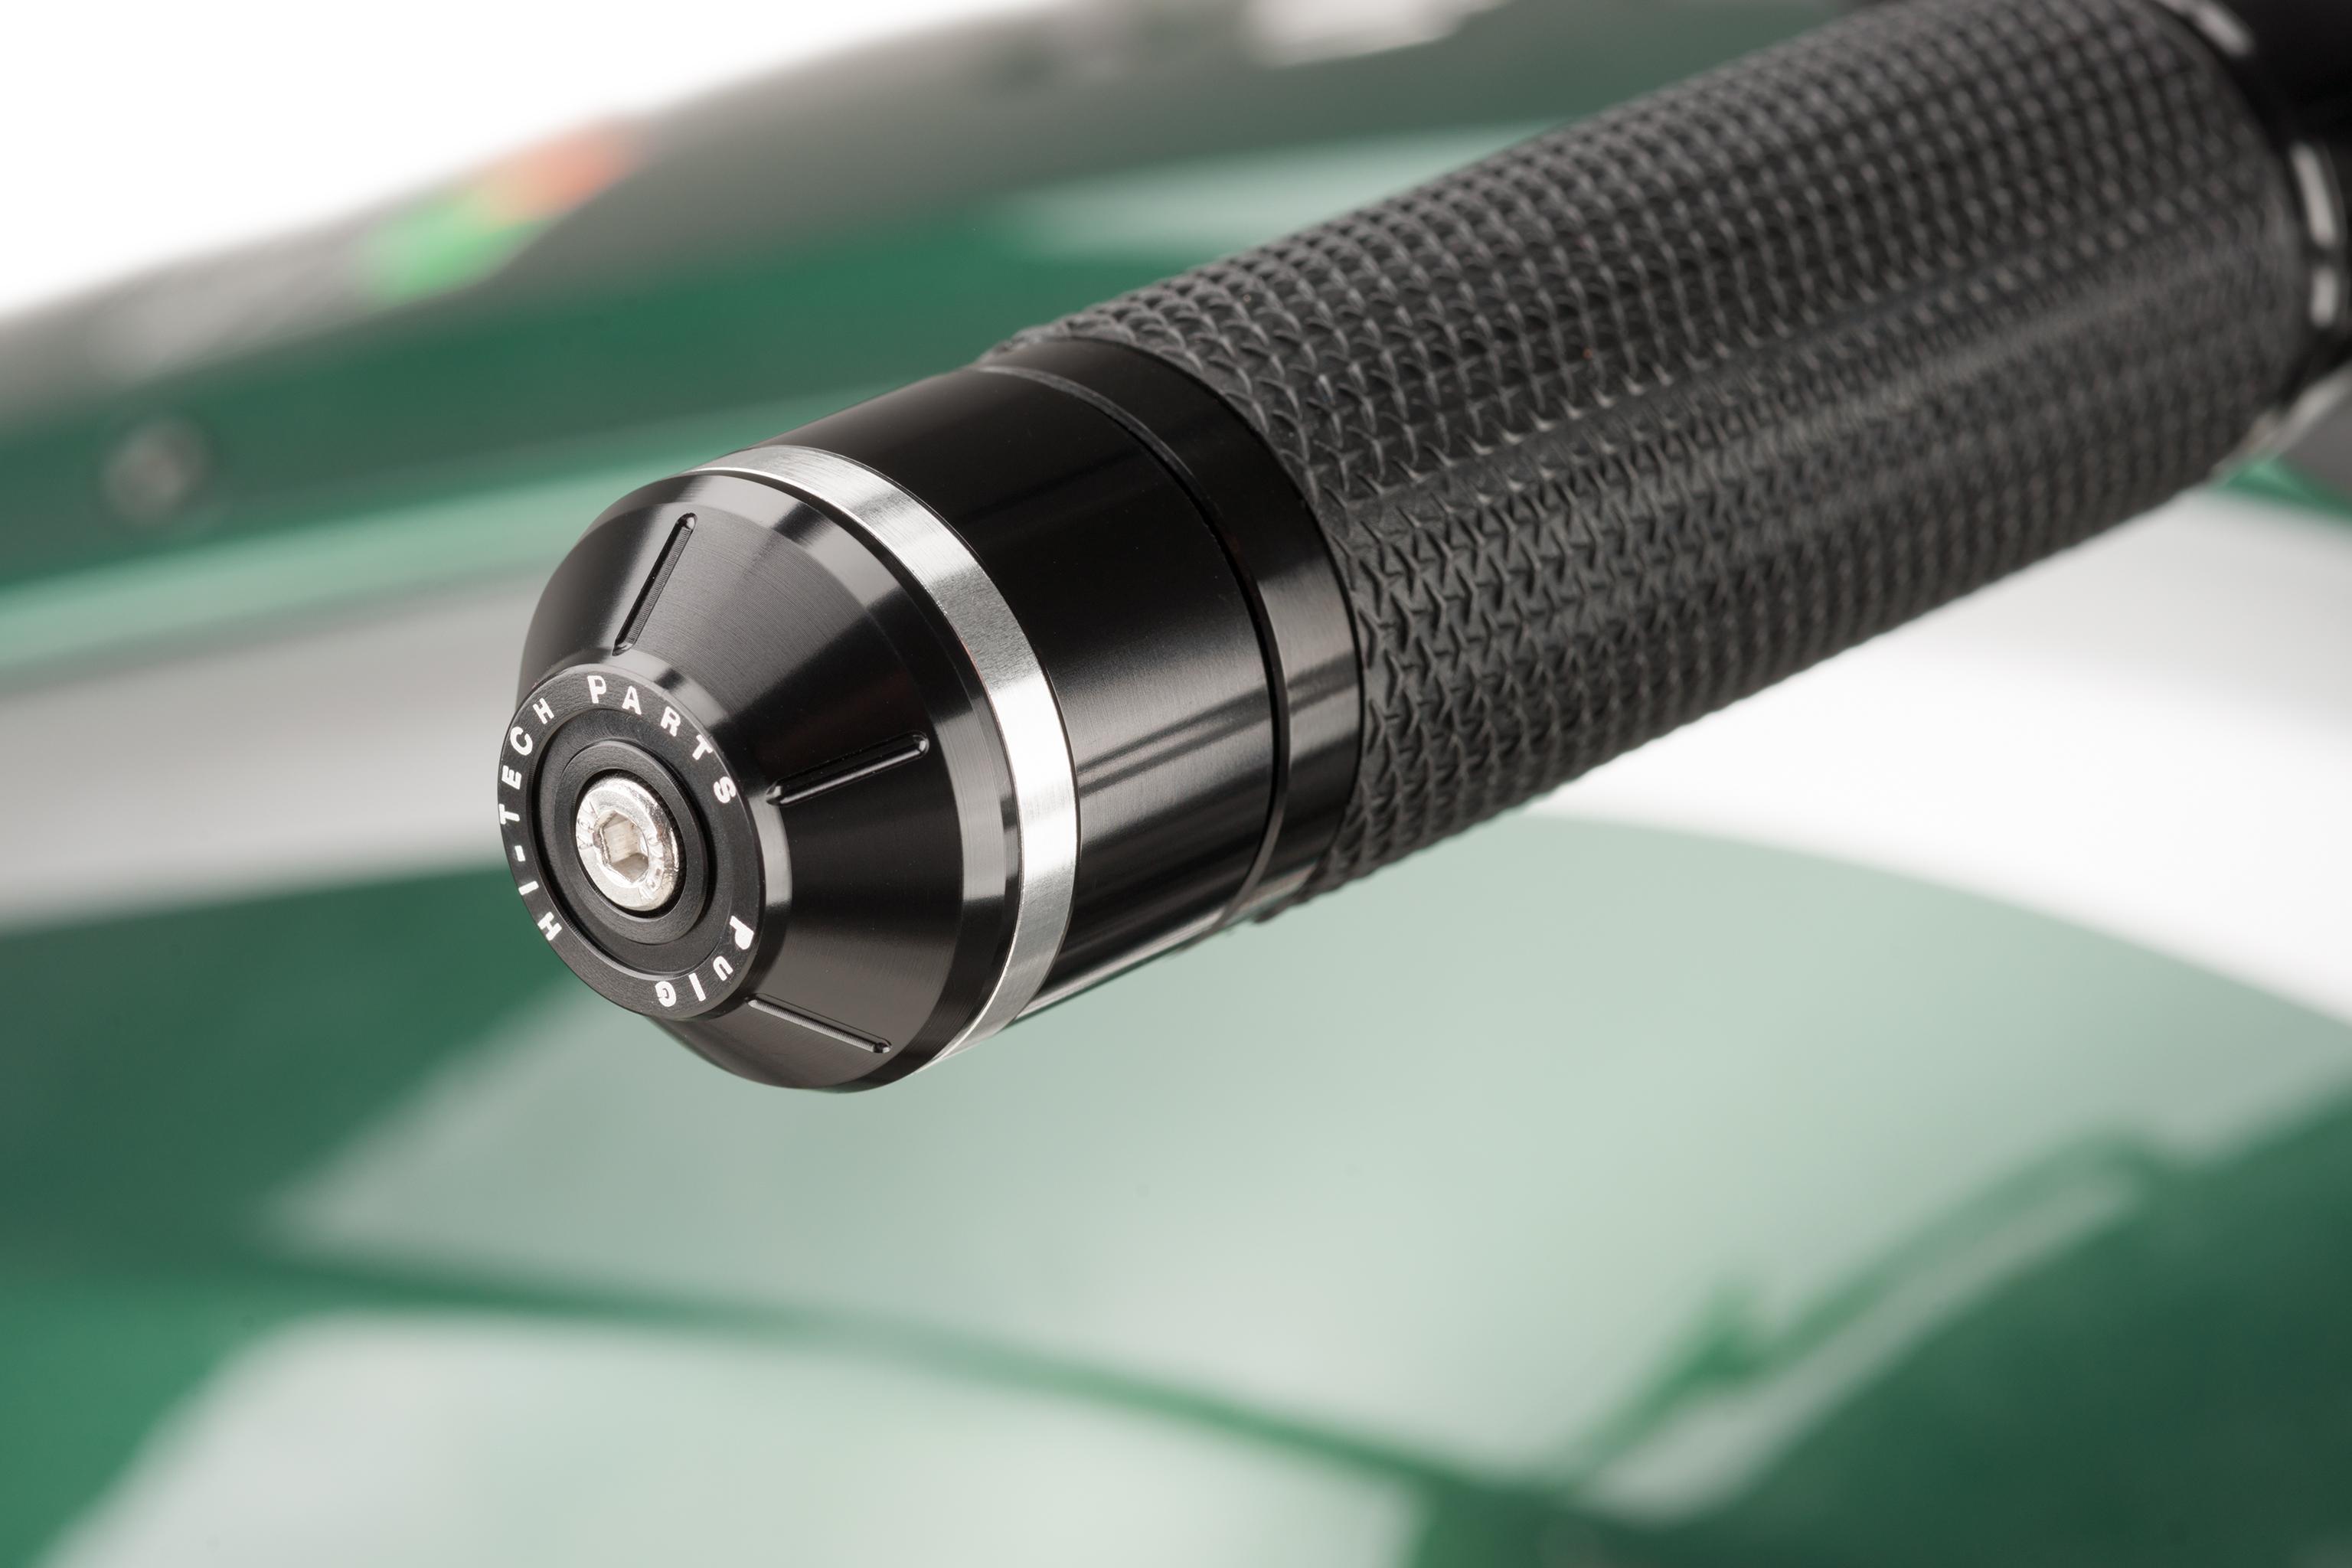 Contrapesos manillar modelo corto con aro Puig 8113 para MV AGUSTA BRUTALE 675 12-17 / BRUTALE 800/R 13-17